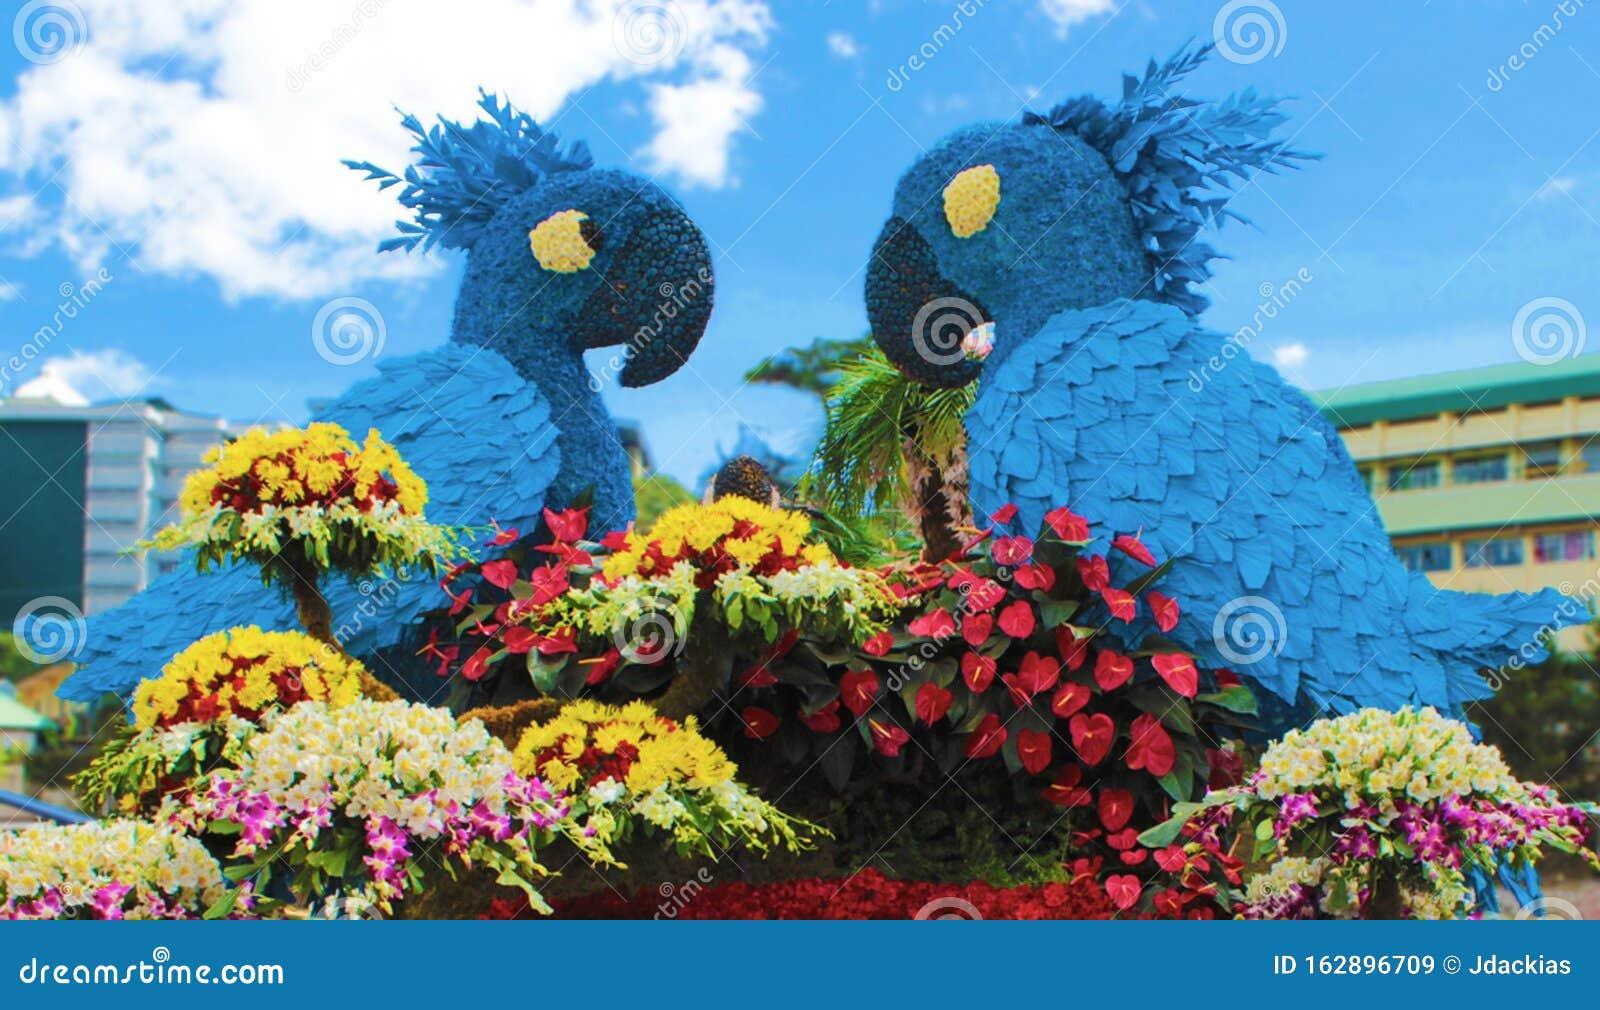 Twitter Inspired Flower Arrangement Displayed at a Flower Festival ...